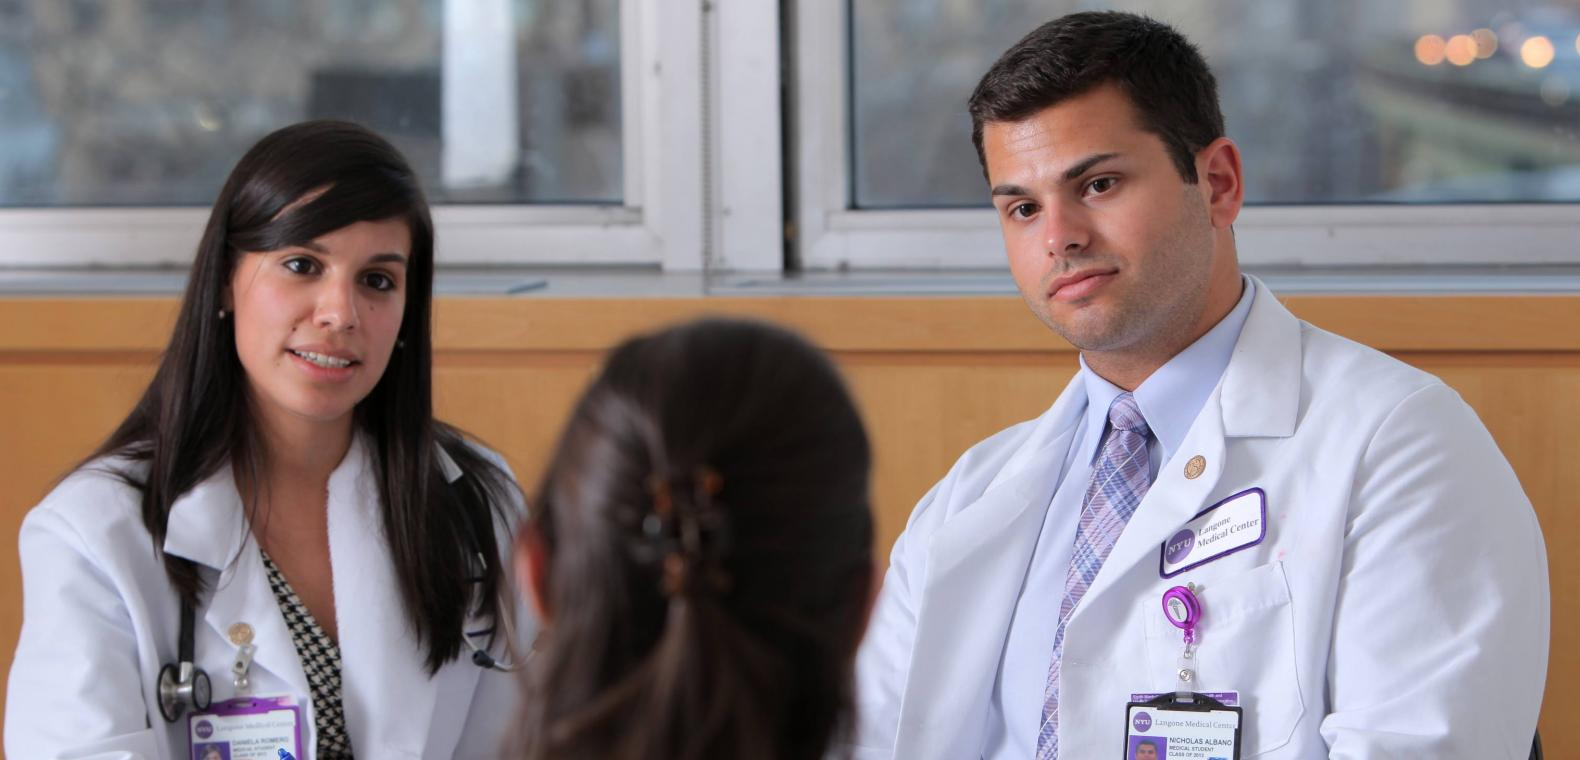 MD Admissions Requirements | NYU School of Medicine | NYU